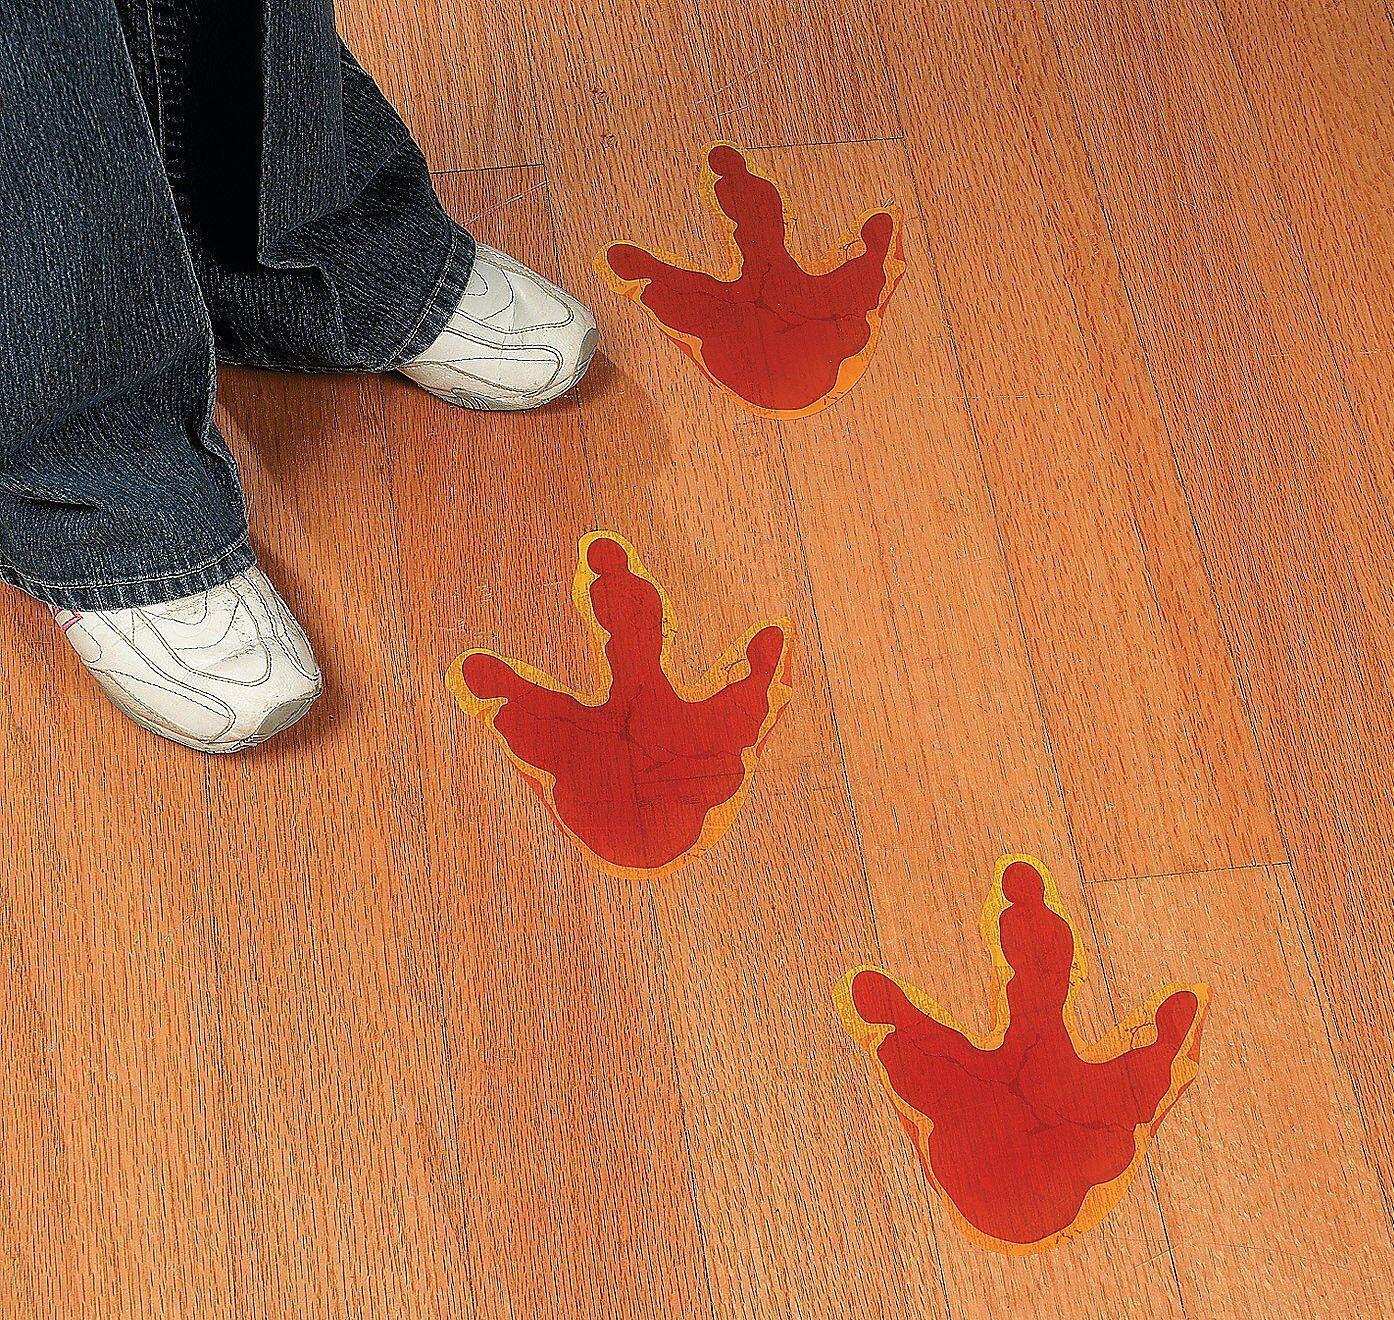 Large Dinosaur Foot Print Floor Decal Clings - 144 Pieces - Fun Express